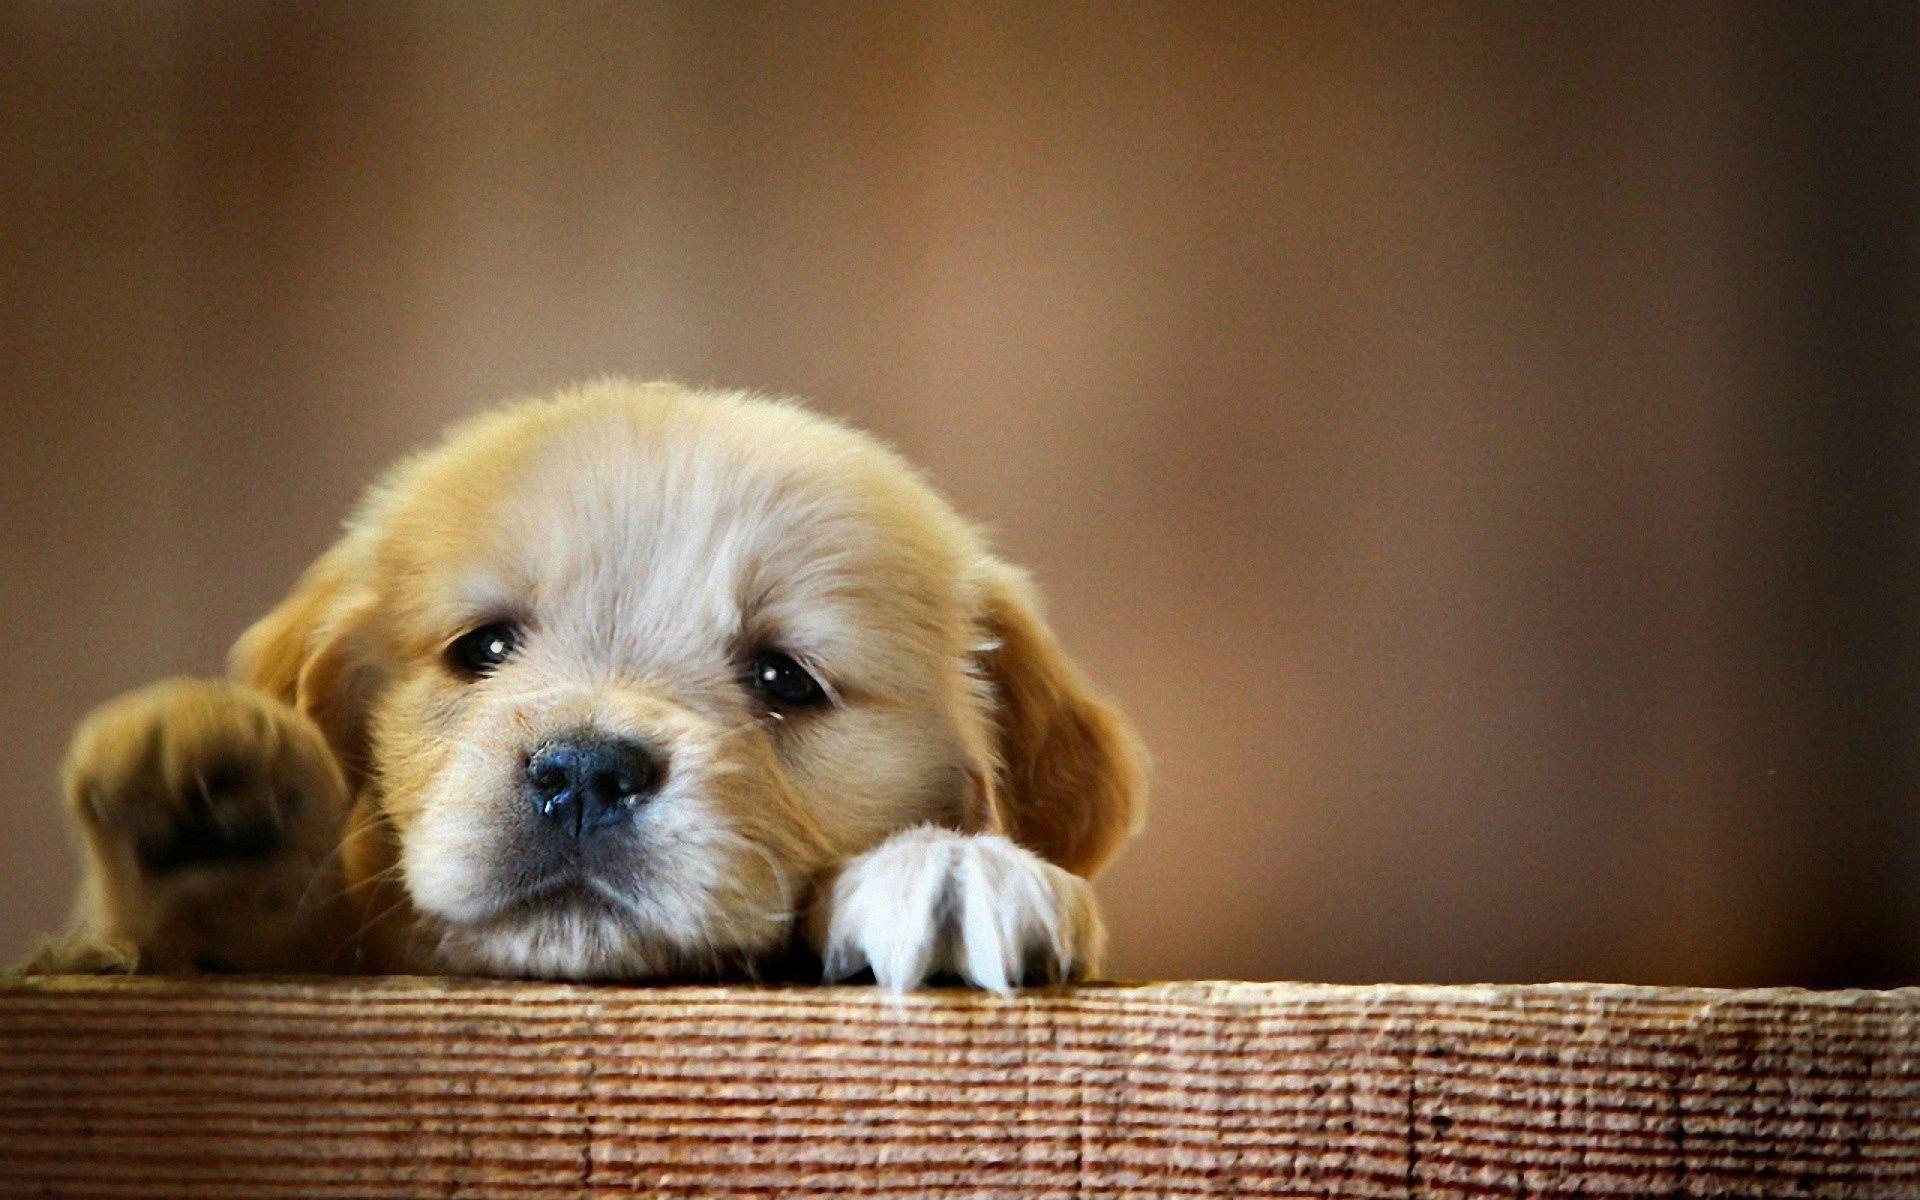 Best Of Puppy Desktop Backgrounds Cute Puppy Wallpaper Dog Wallpaper Cute Dog Wallpaper